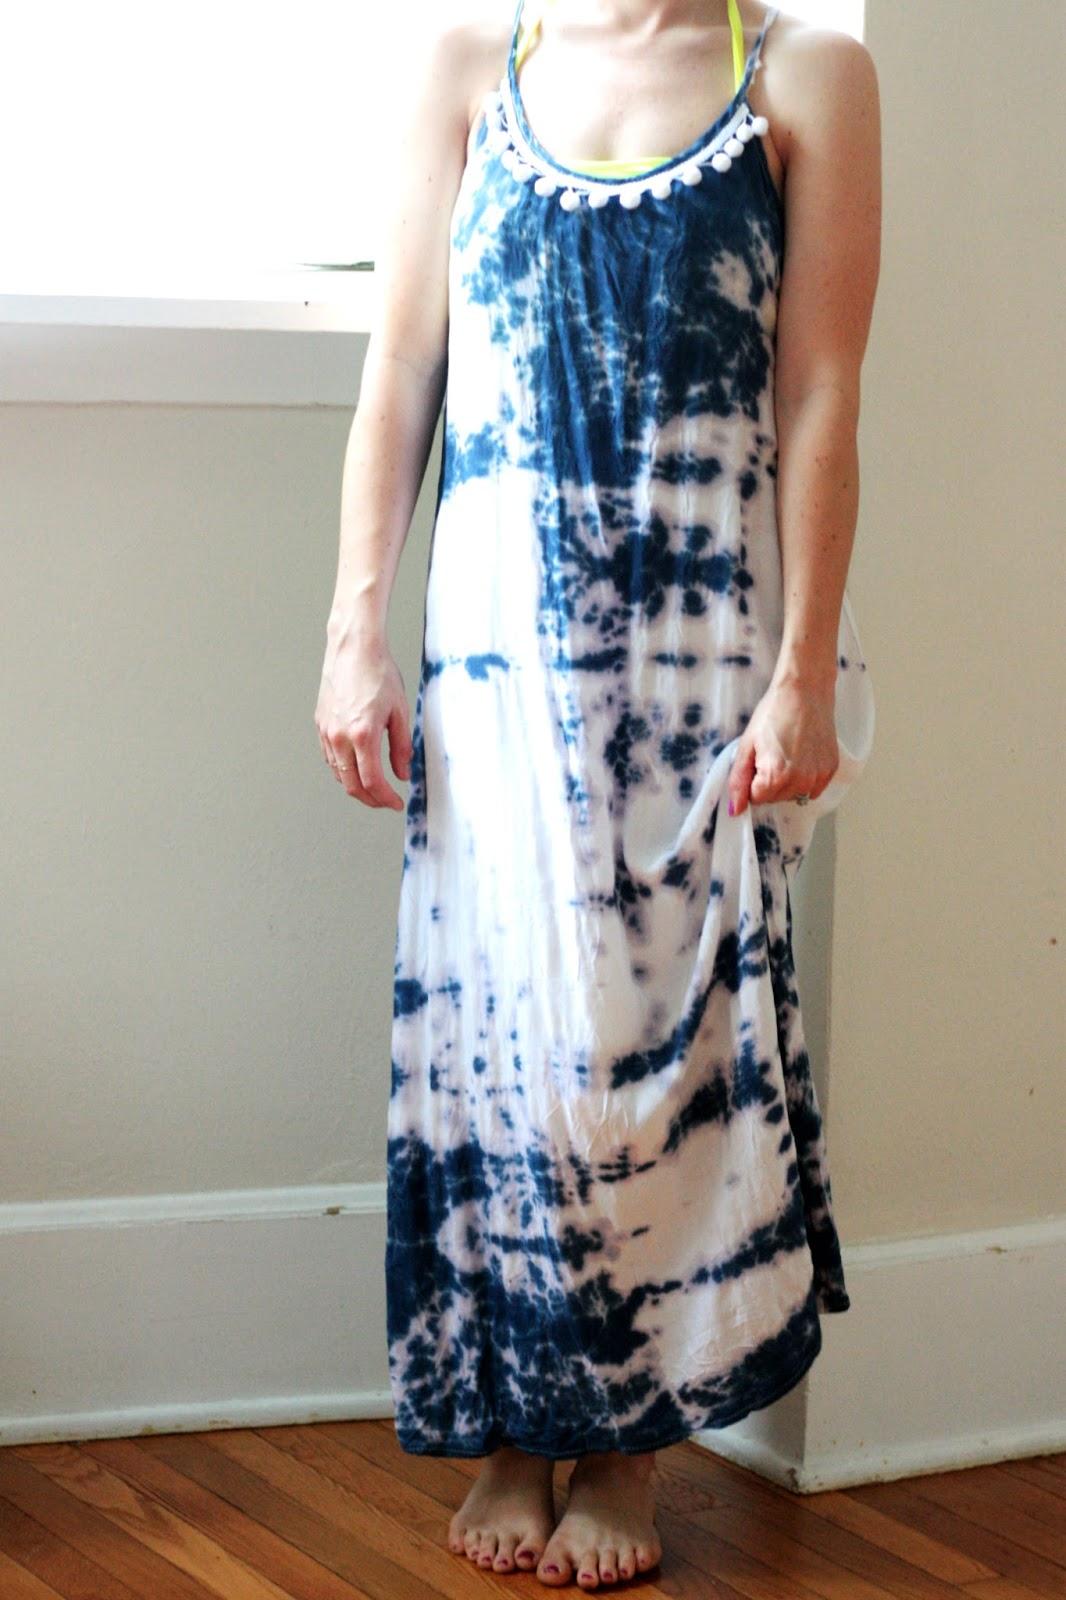 DIY: EMBELLISHED TIE-DYE MAXI DRESS TUTORIAL